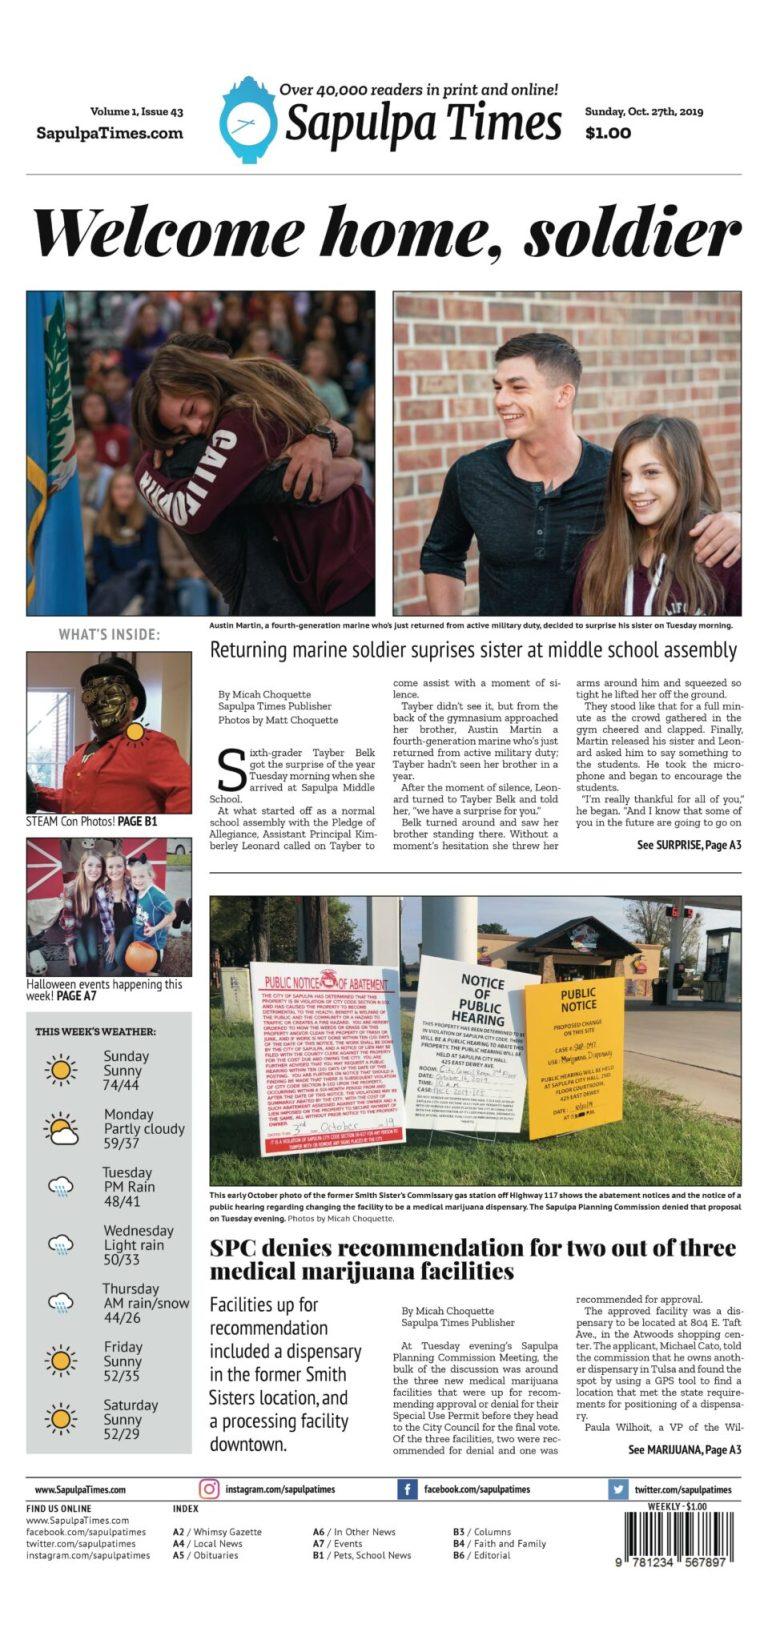 Sapulpa Times Digital Edition 10/27/2019